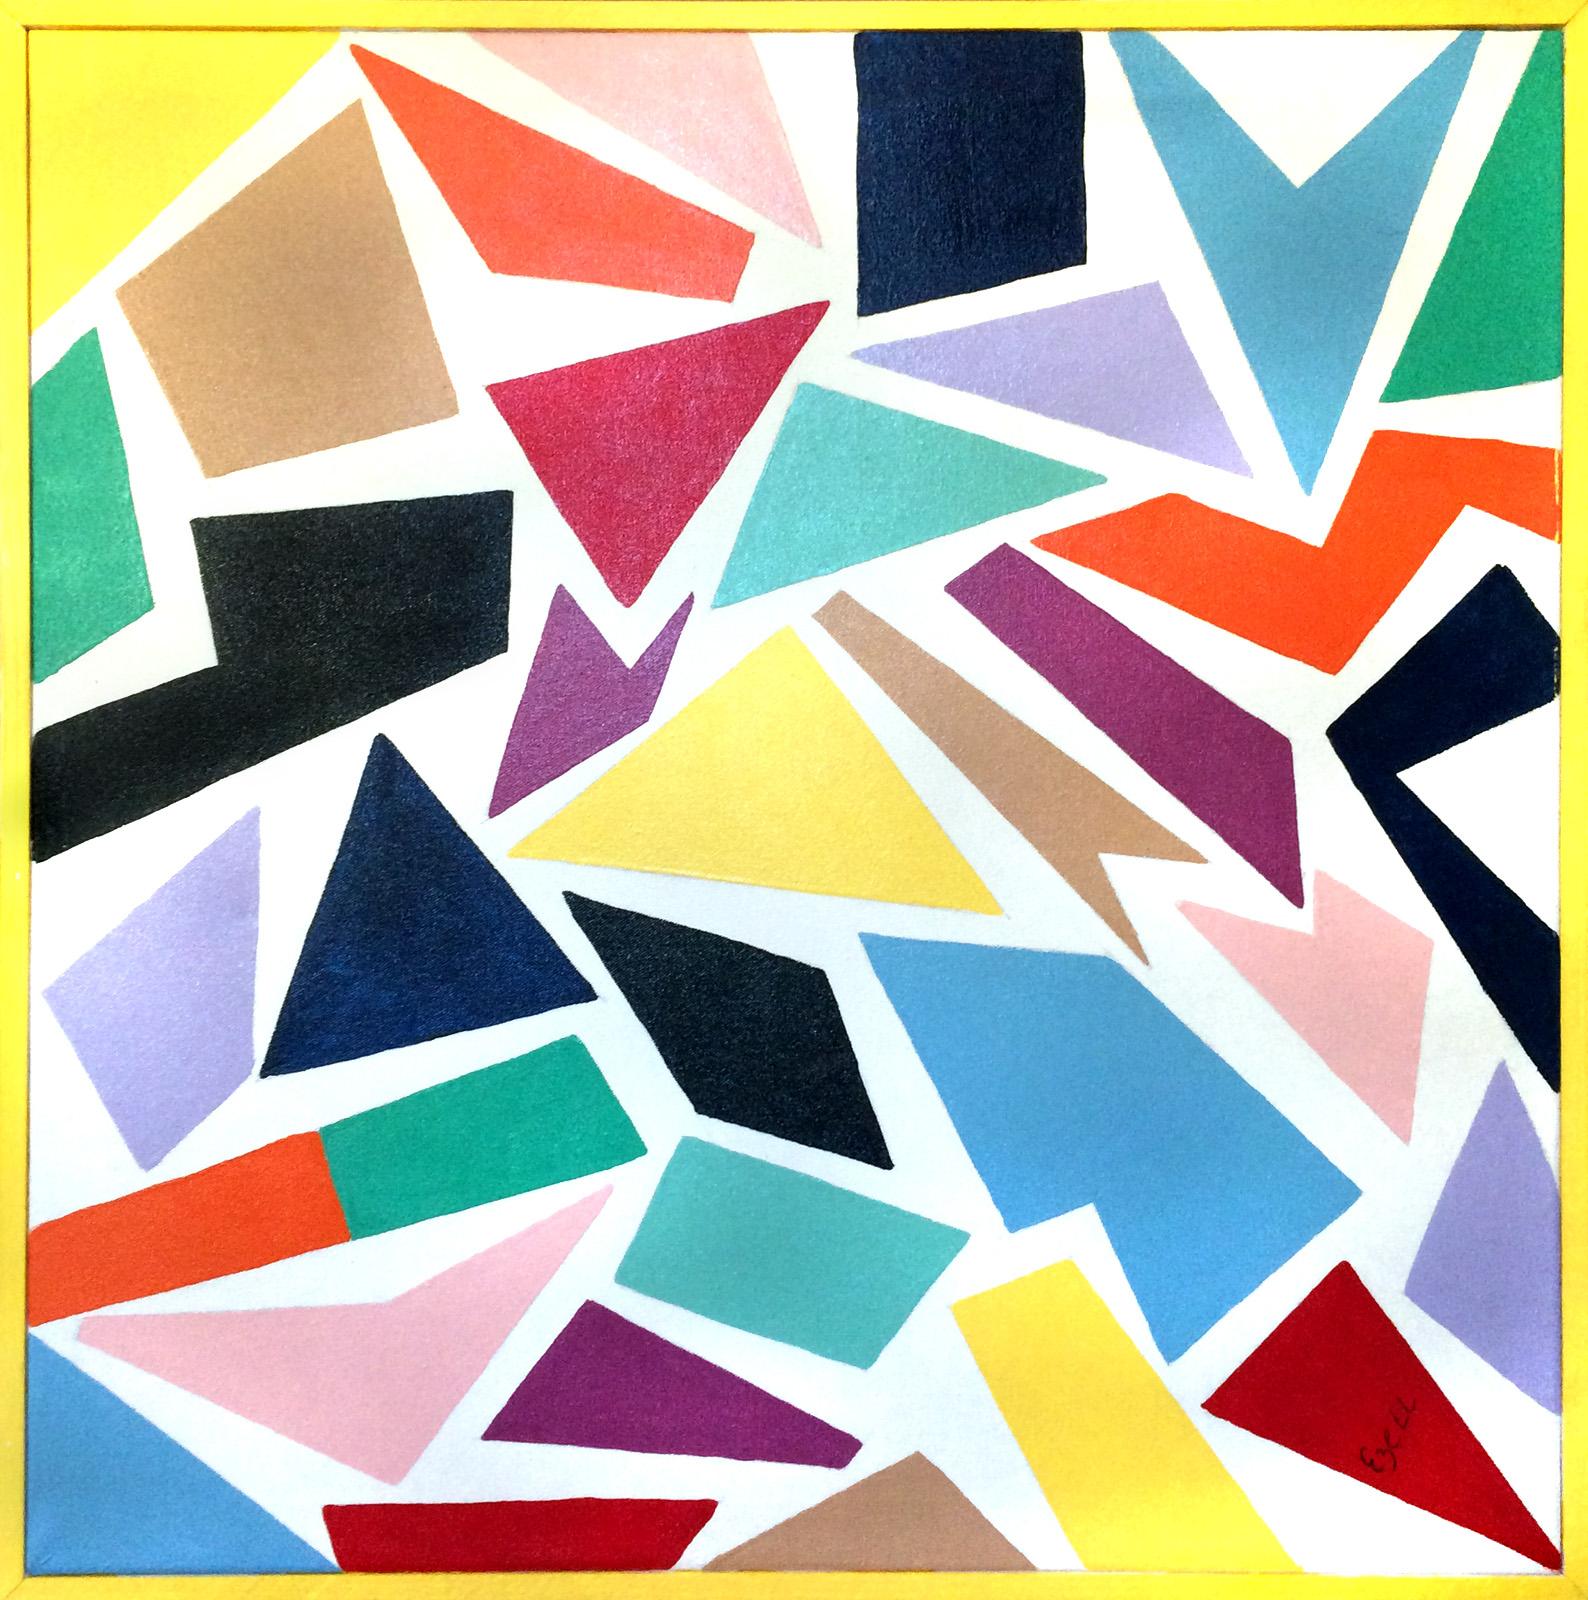 Fragments by Sam Ezell